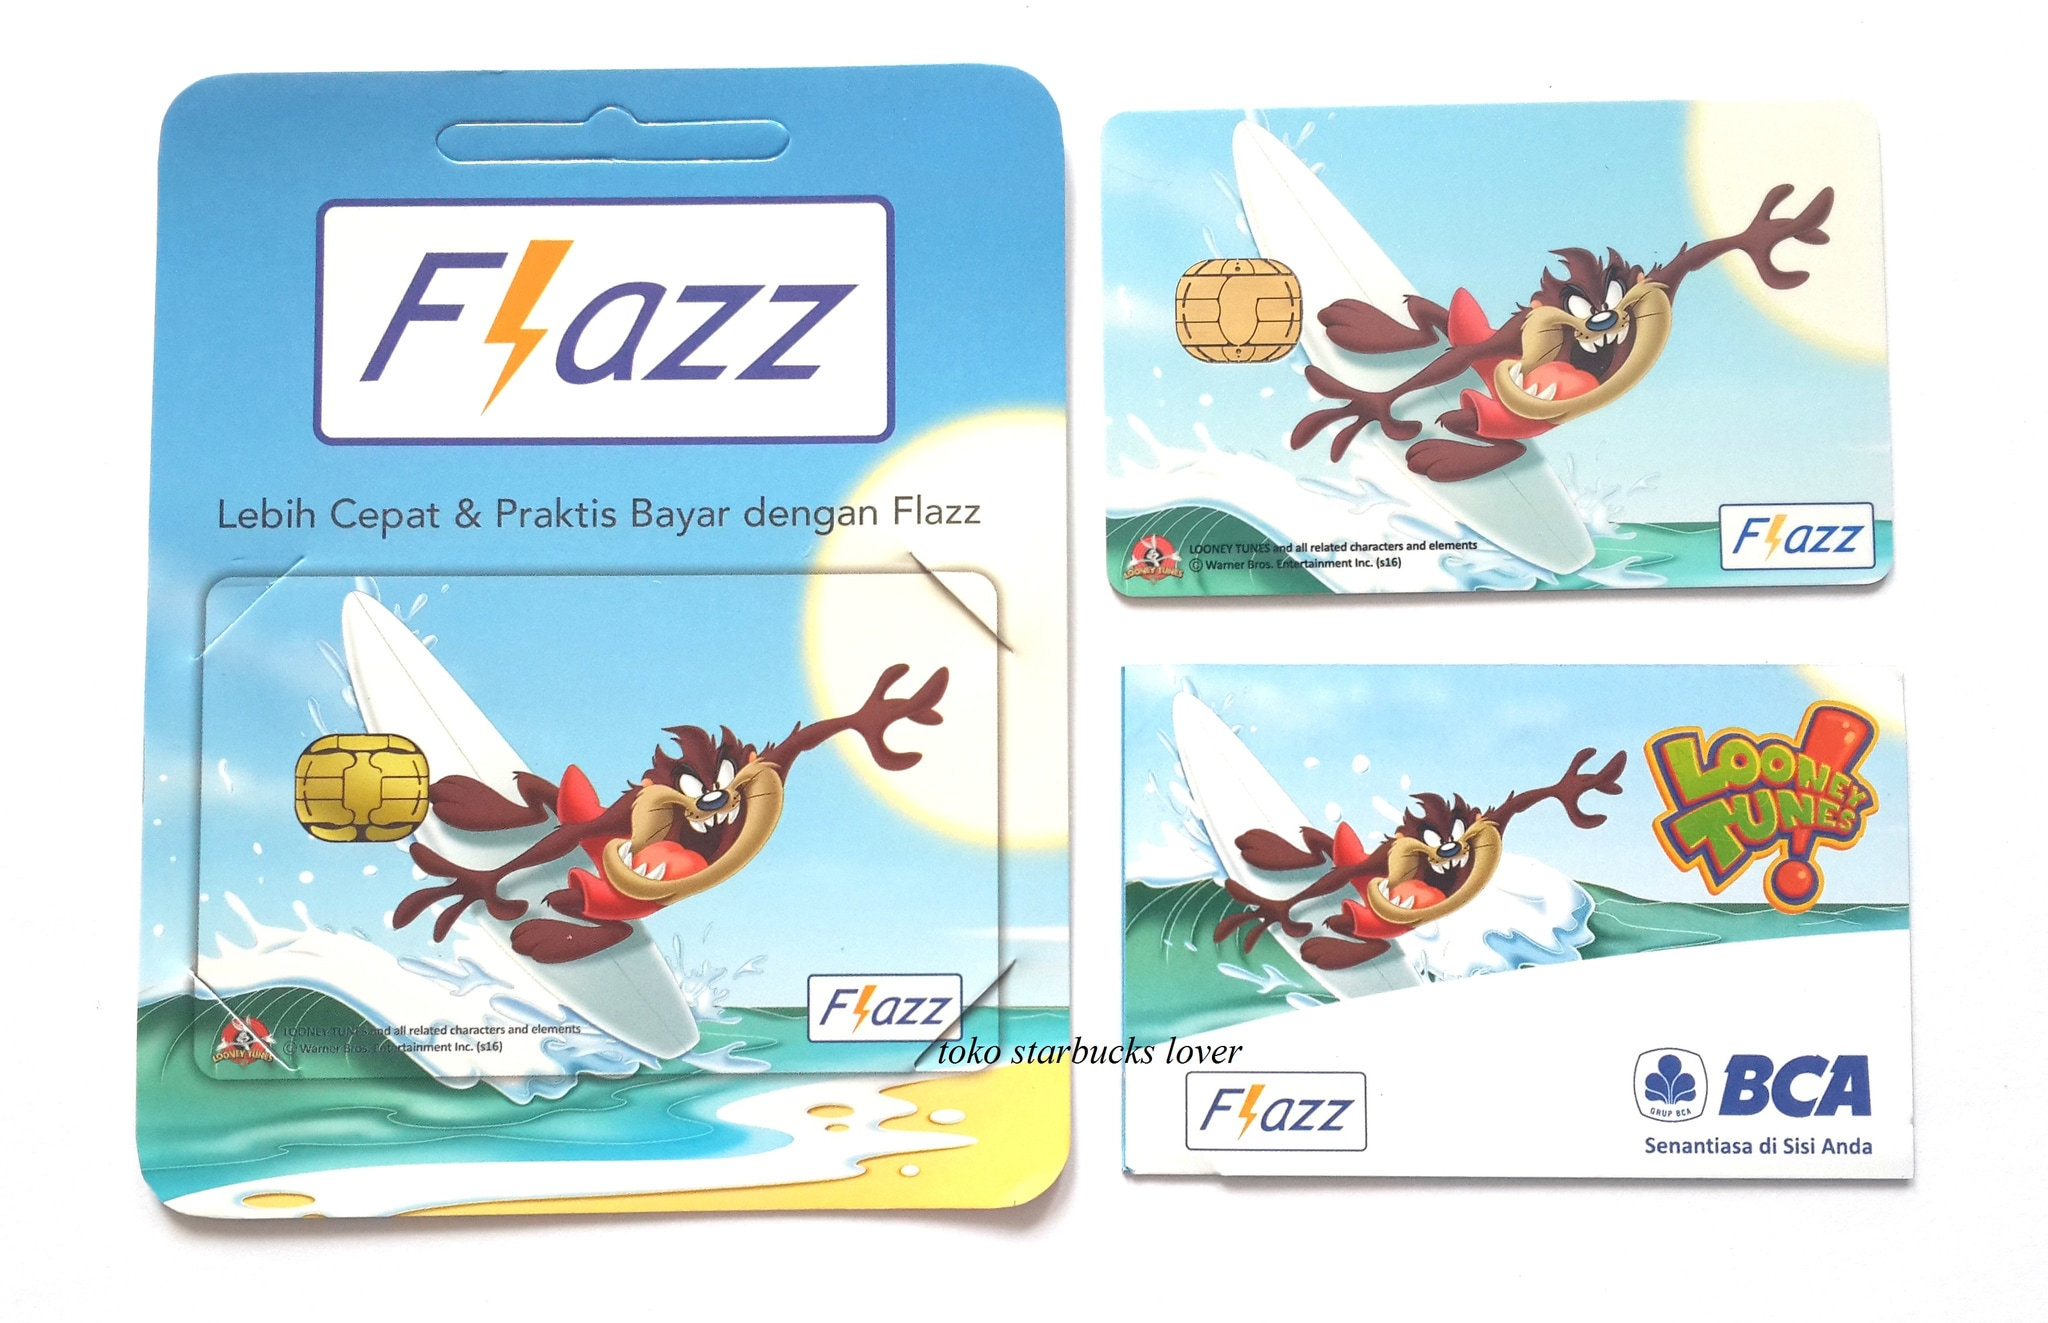 Kartu Flazz BCA Saldo 0 Looney Tunes Series2